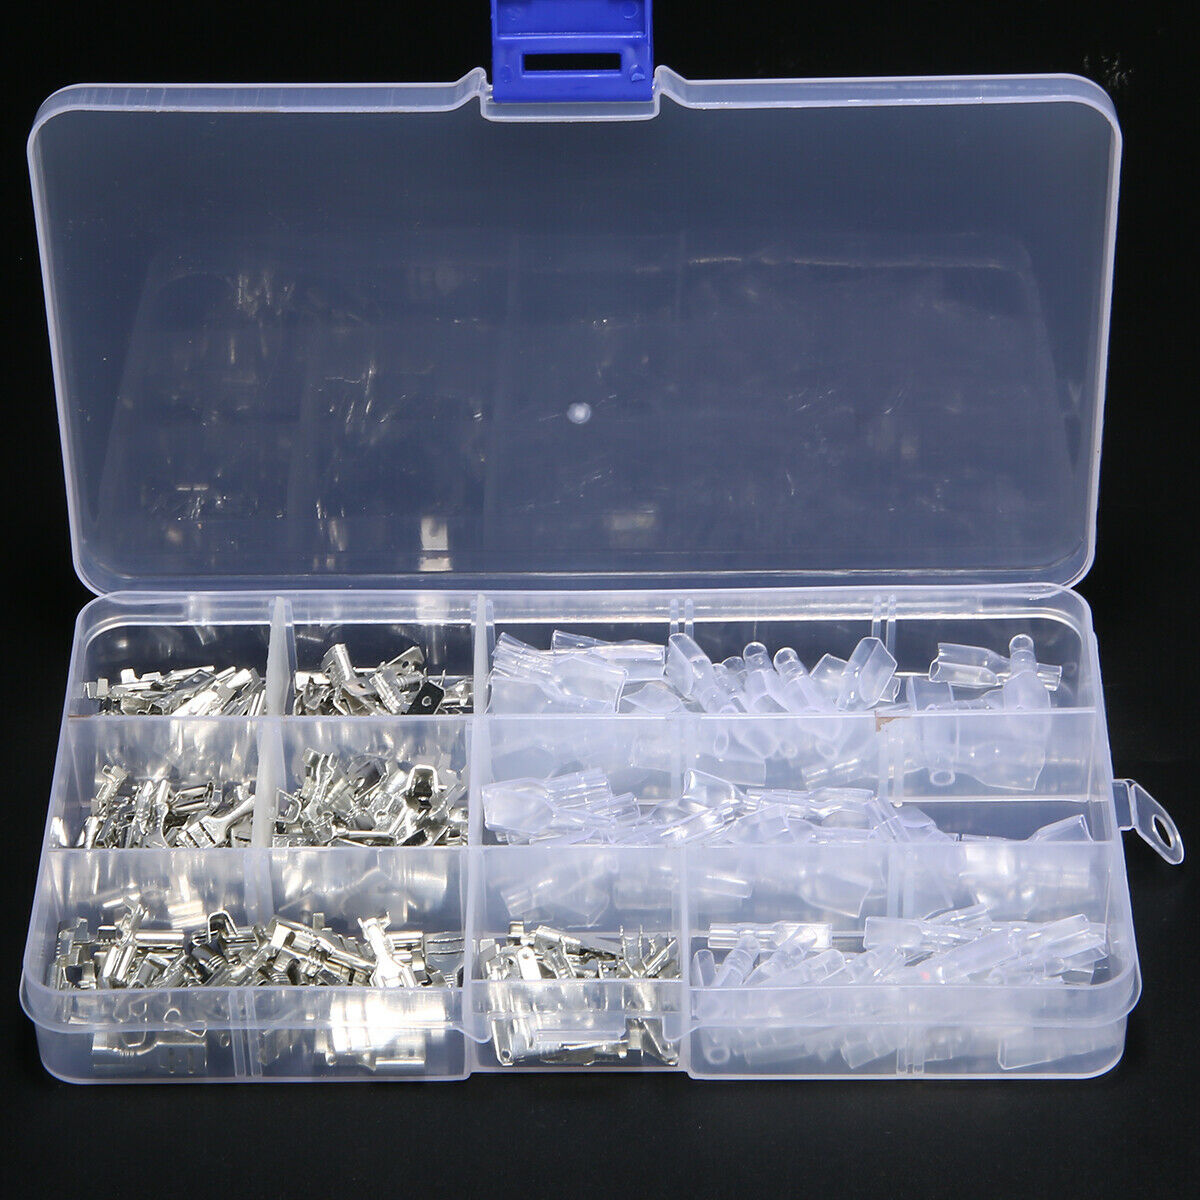 270pc Assortment Terminal Kit Electrical Wire Crimp Connectors Male Female Spade 5